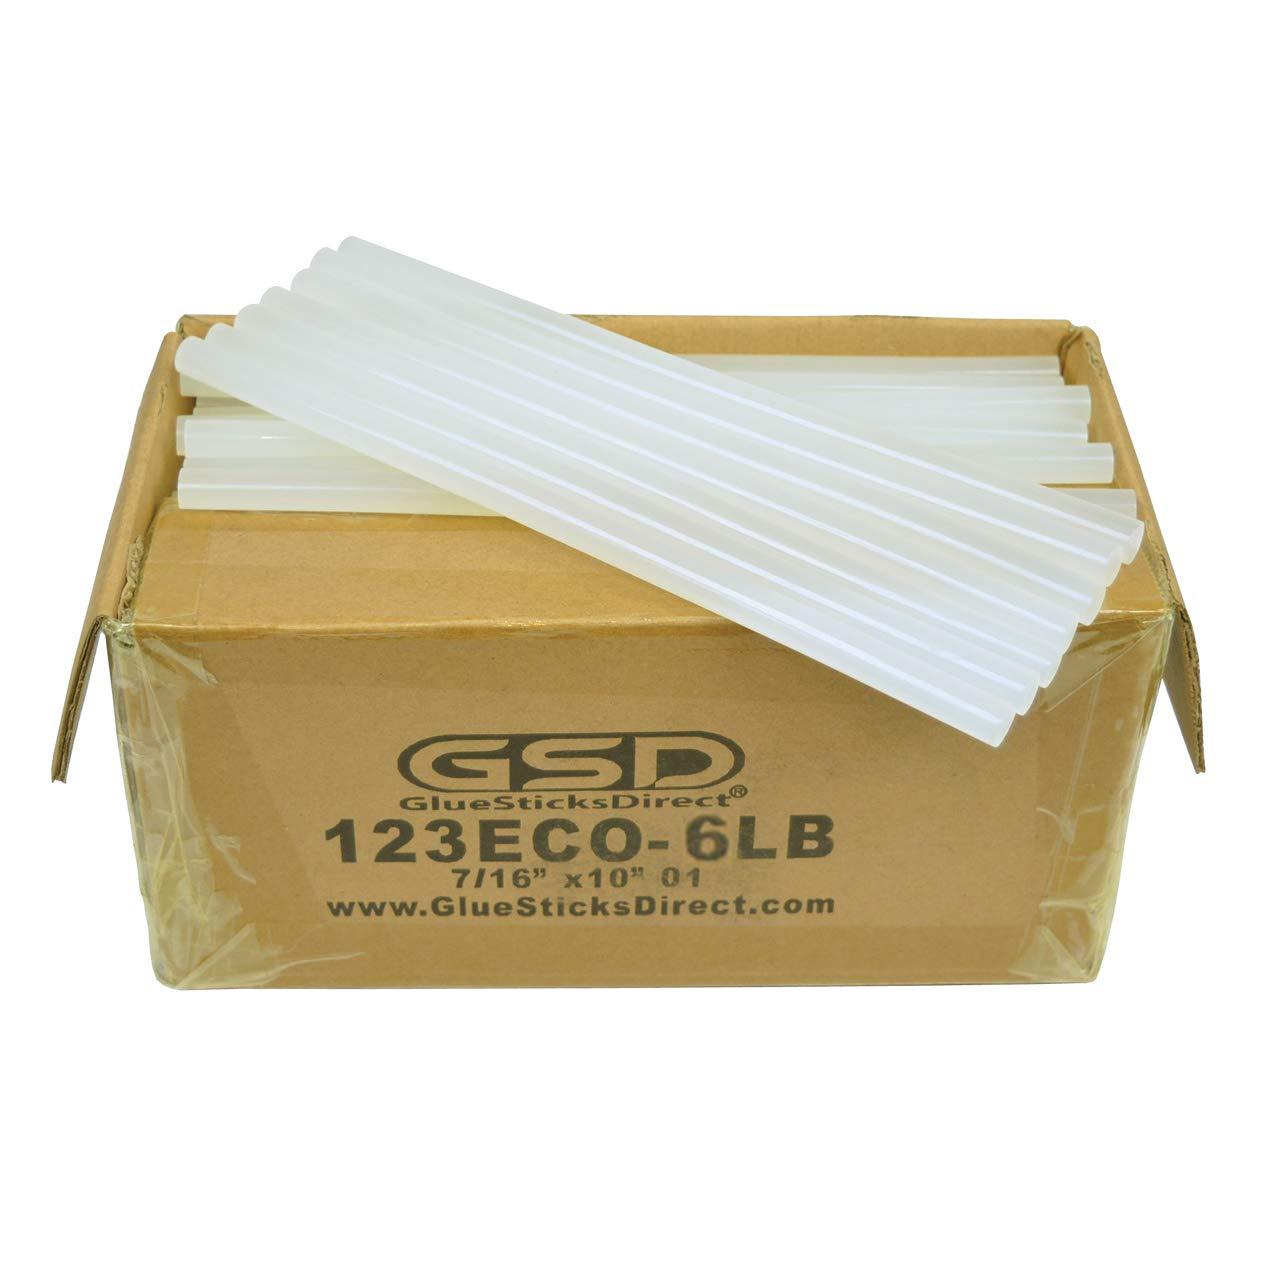 GlueSticksDirect Economy Hot Melt Glue Sticks 7/16'' X 10'' 110 Sticks 6 lbs bulk by GlueSticksDirect.com